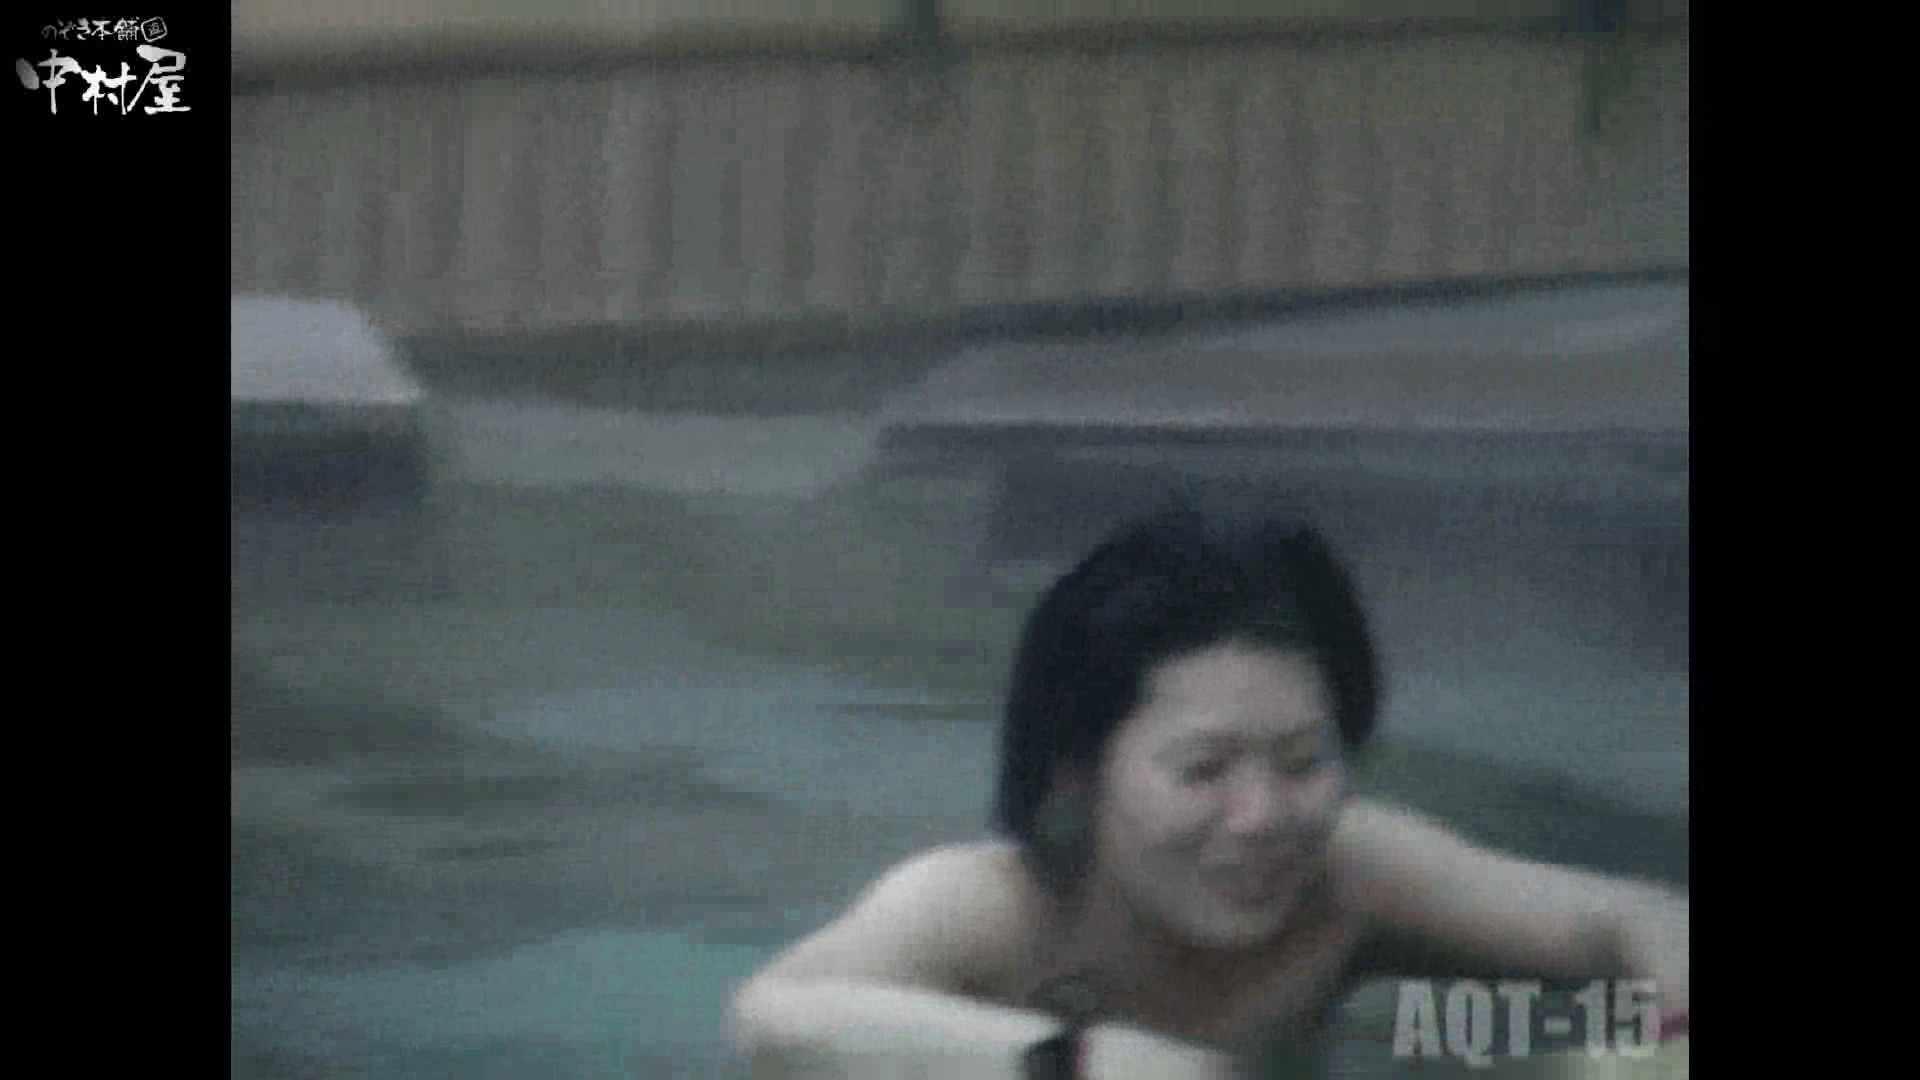 Aquaな露天風呂Vol.878潜入盗撮露天風呂十五判湯 其の七 潜入 | 盗撮動画  10枚 7